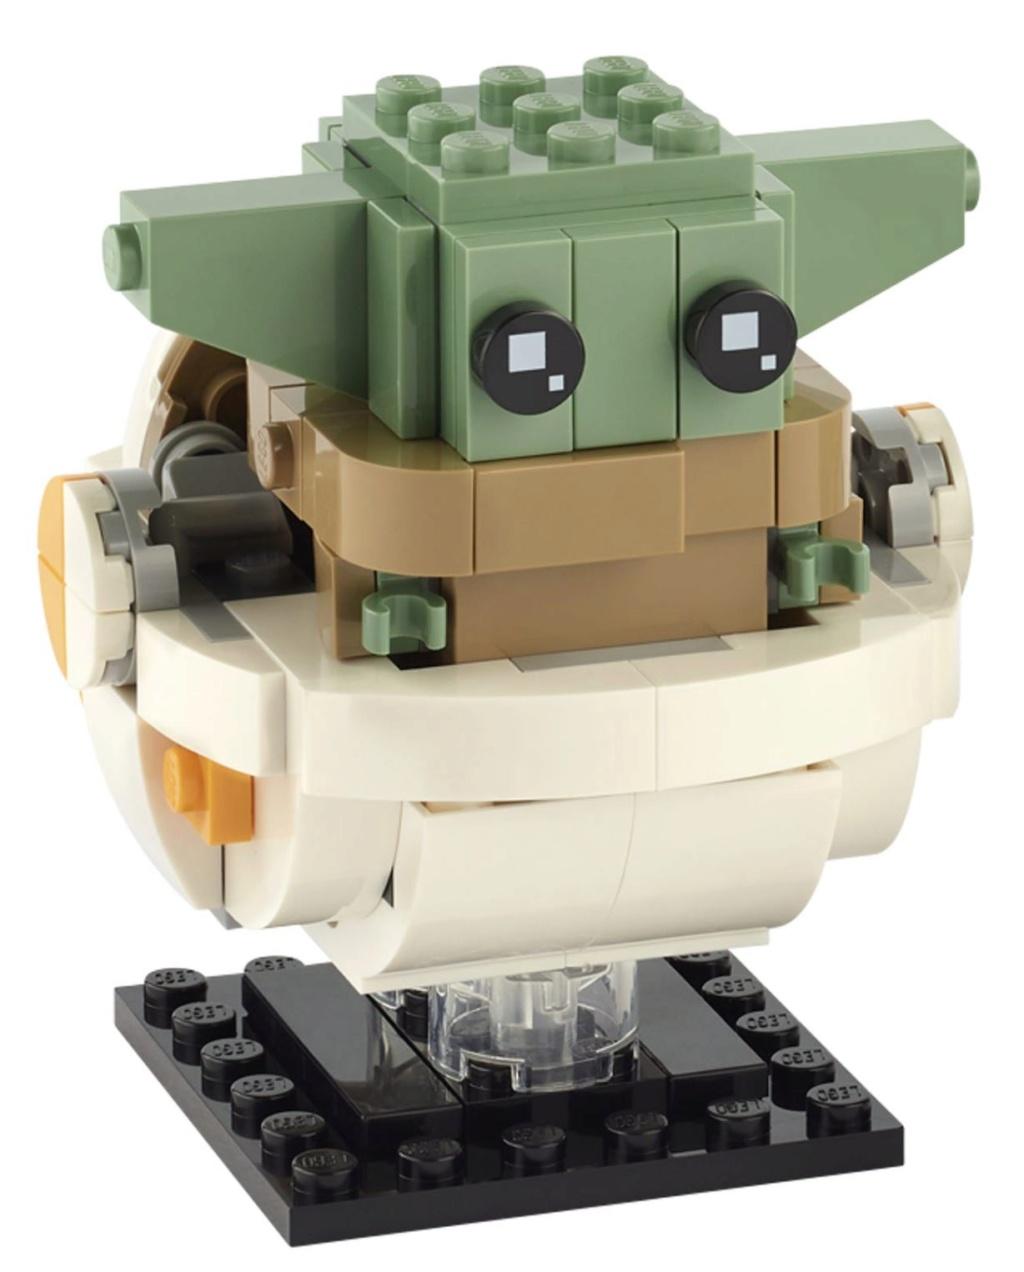 LEGO StarWars 75317 BrickHeadz The Mandalorian & The Child 75317_14